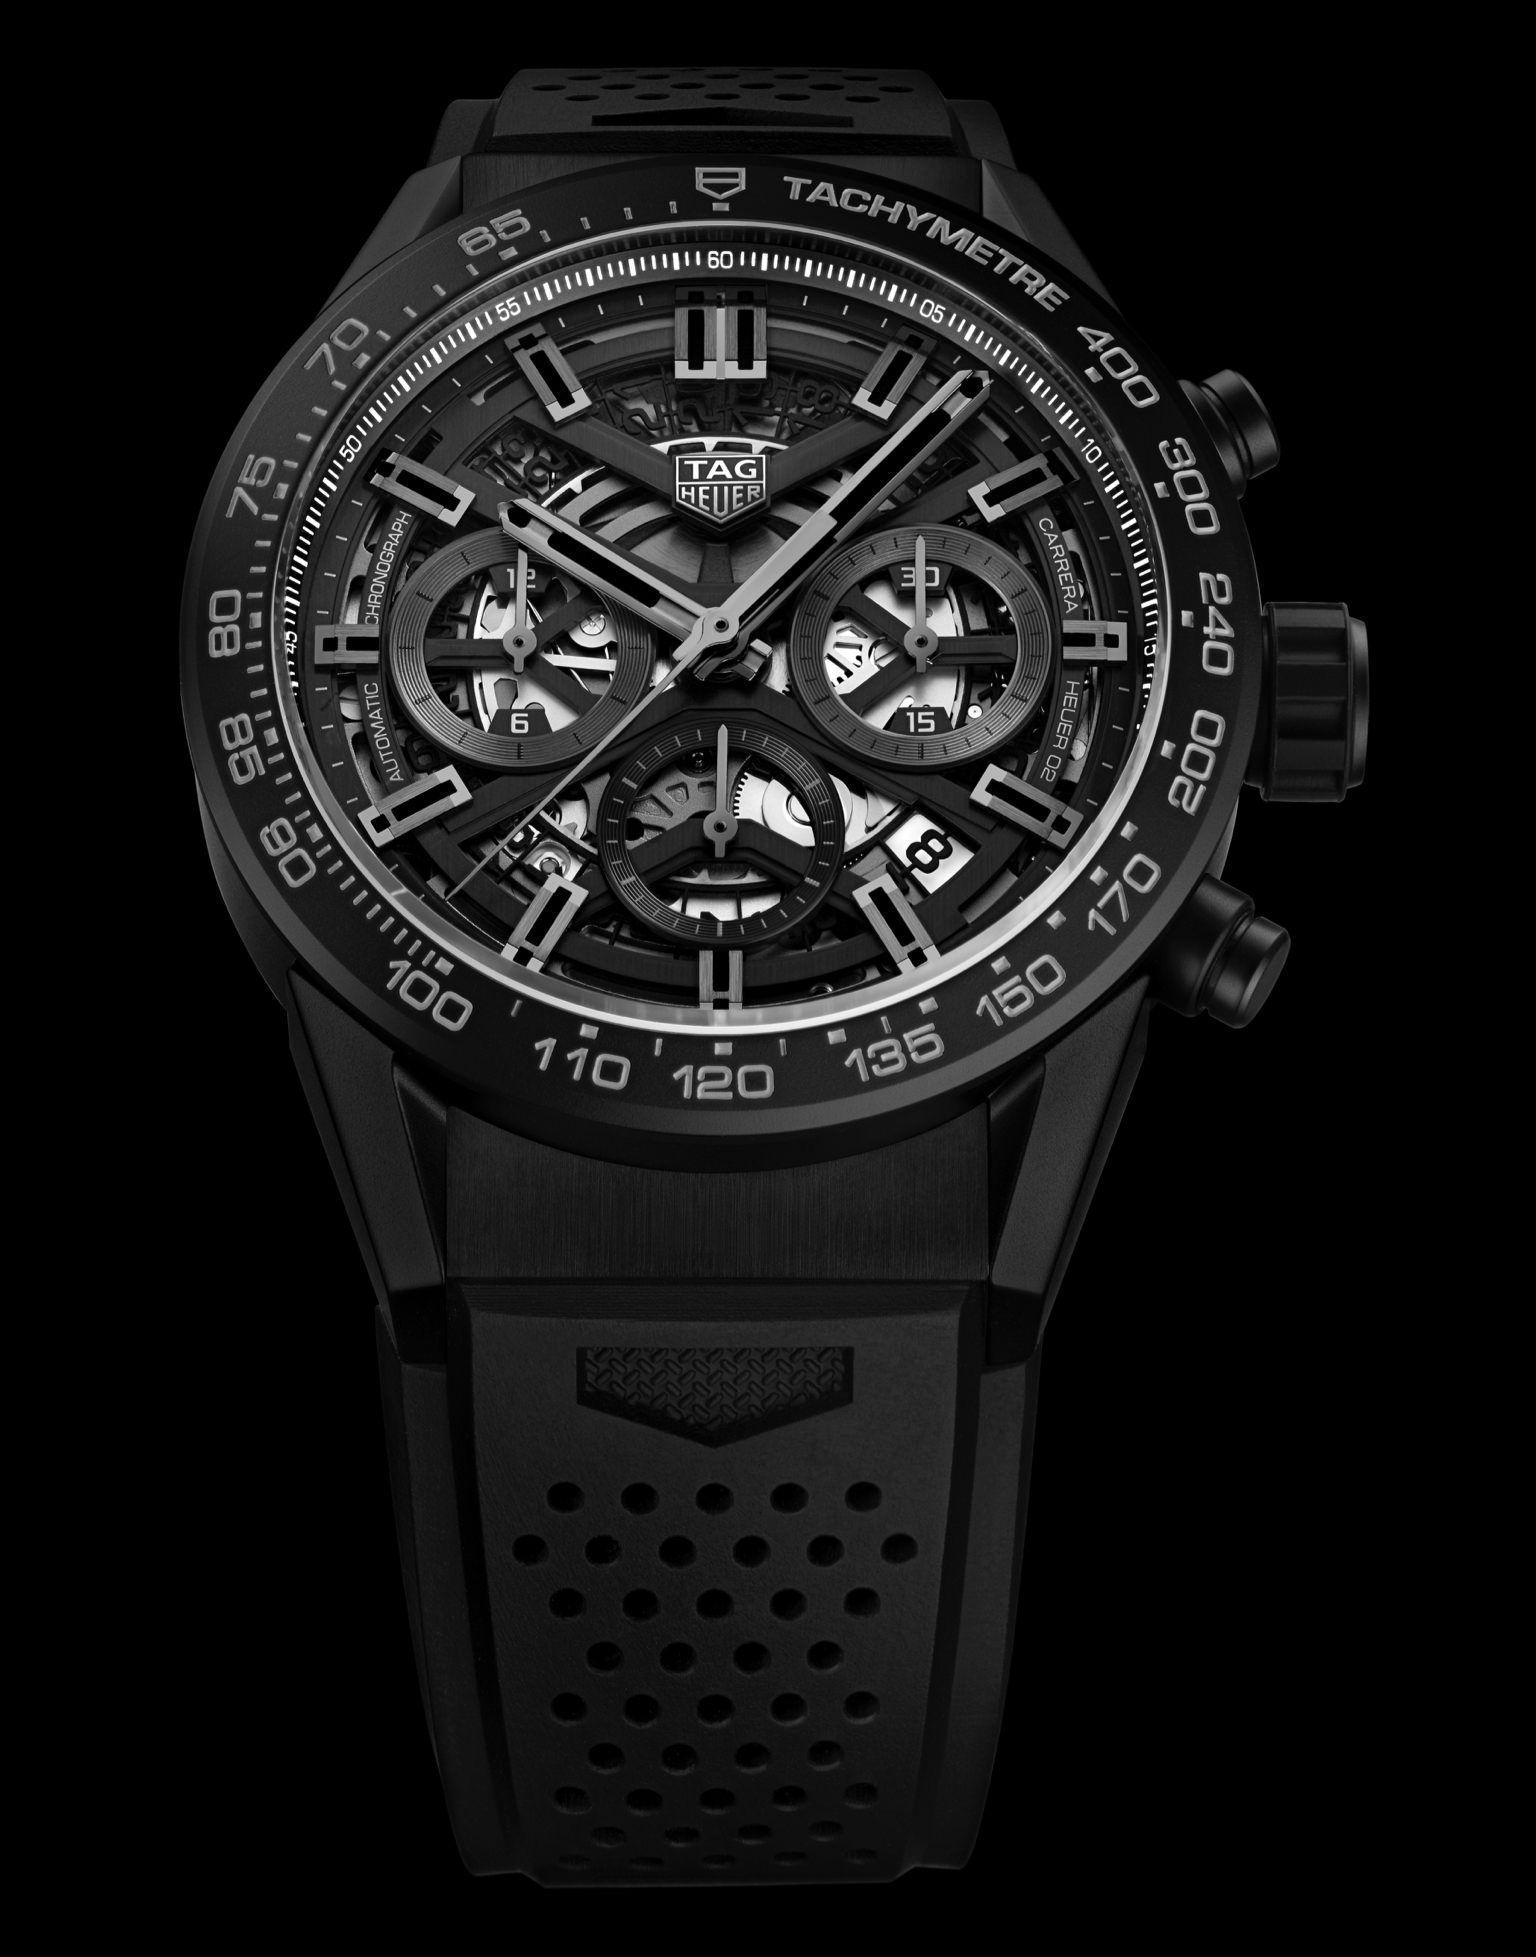 17adbe24357 2018 TAG Heuer Carrera Heuer-02 Carbon Fibre Ref. CBG2016 | Watches ...